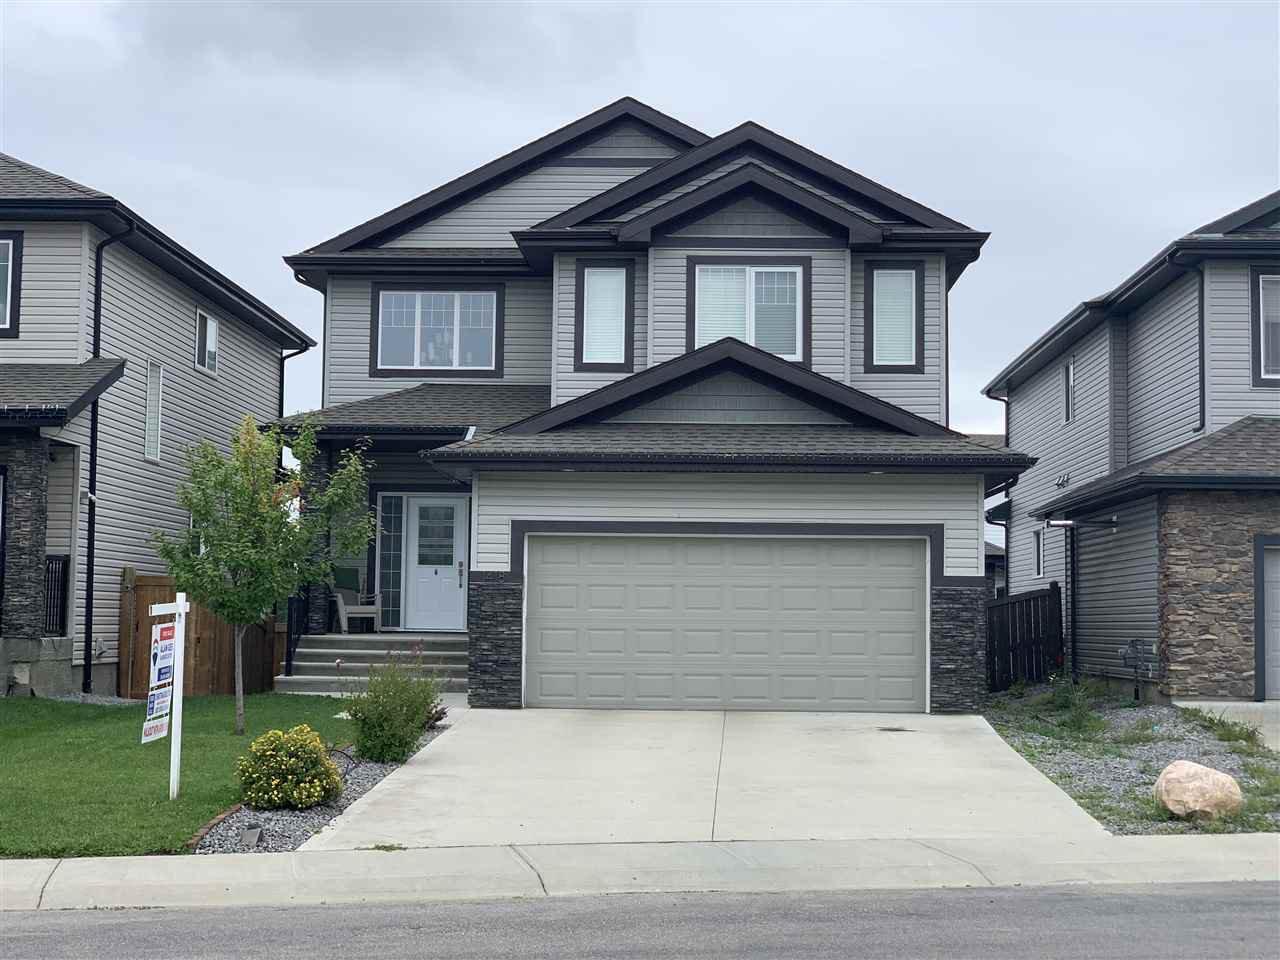 Main Photo: 1418 HAYS Way in Edmonton: Zone 58 House for sale : MLS®# E4170389